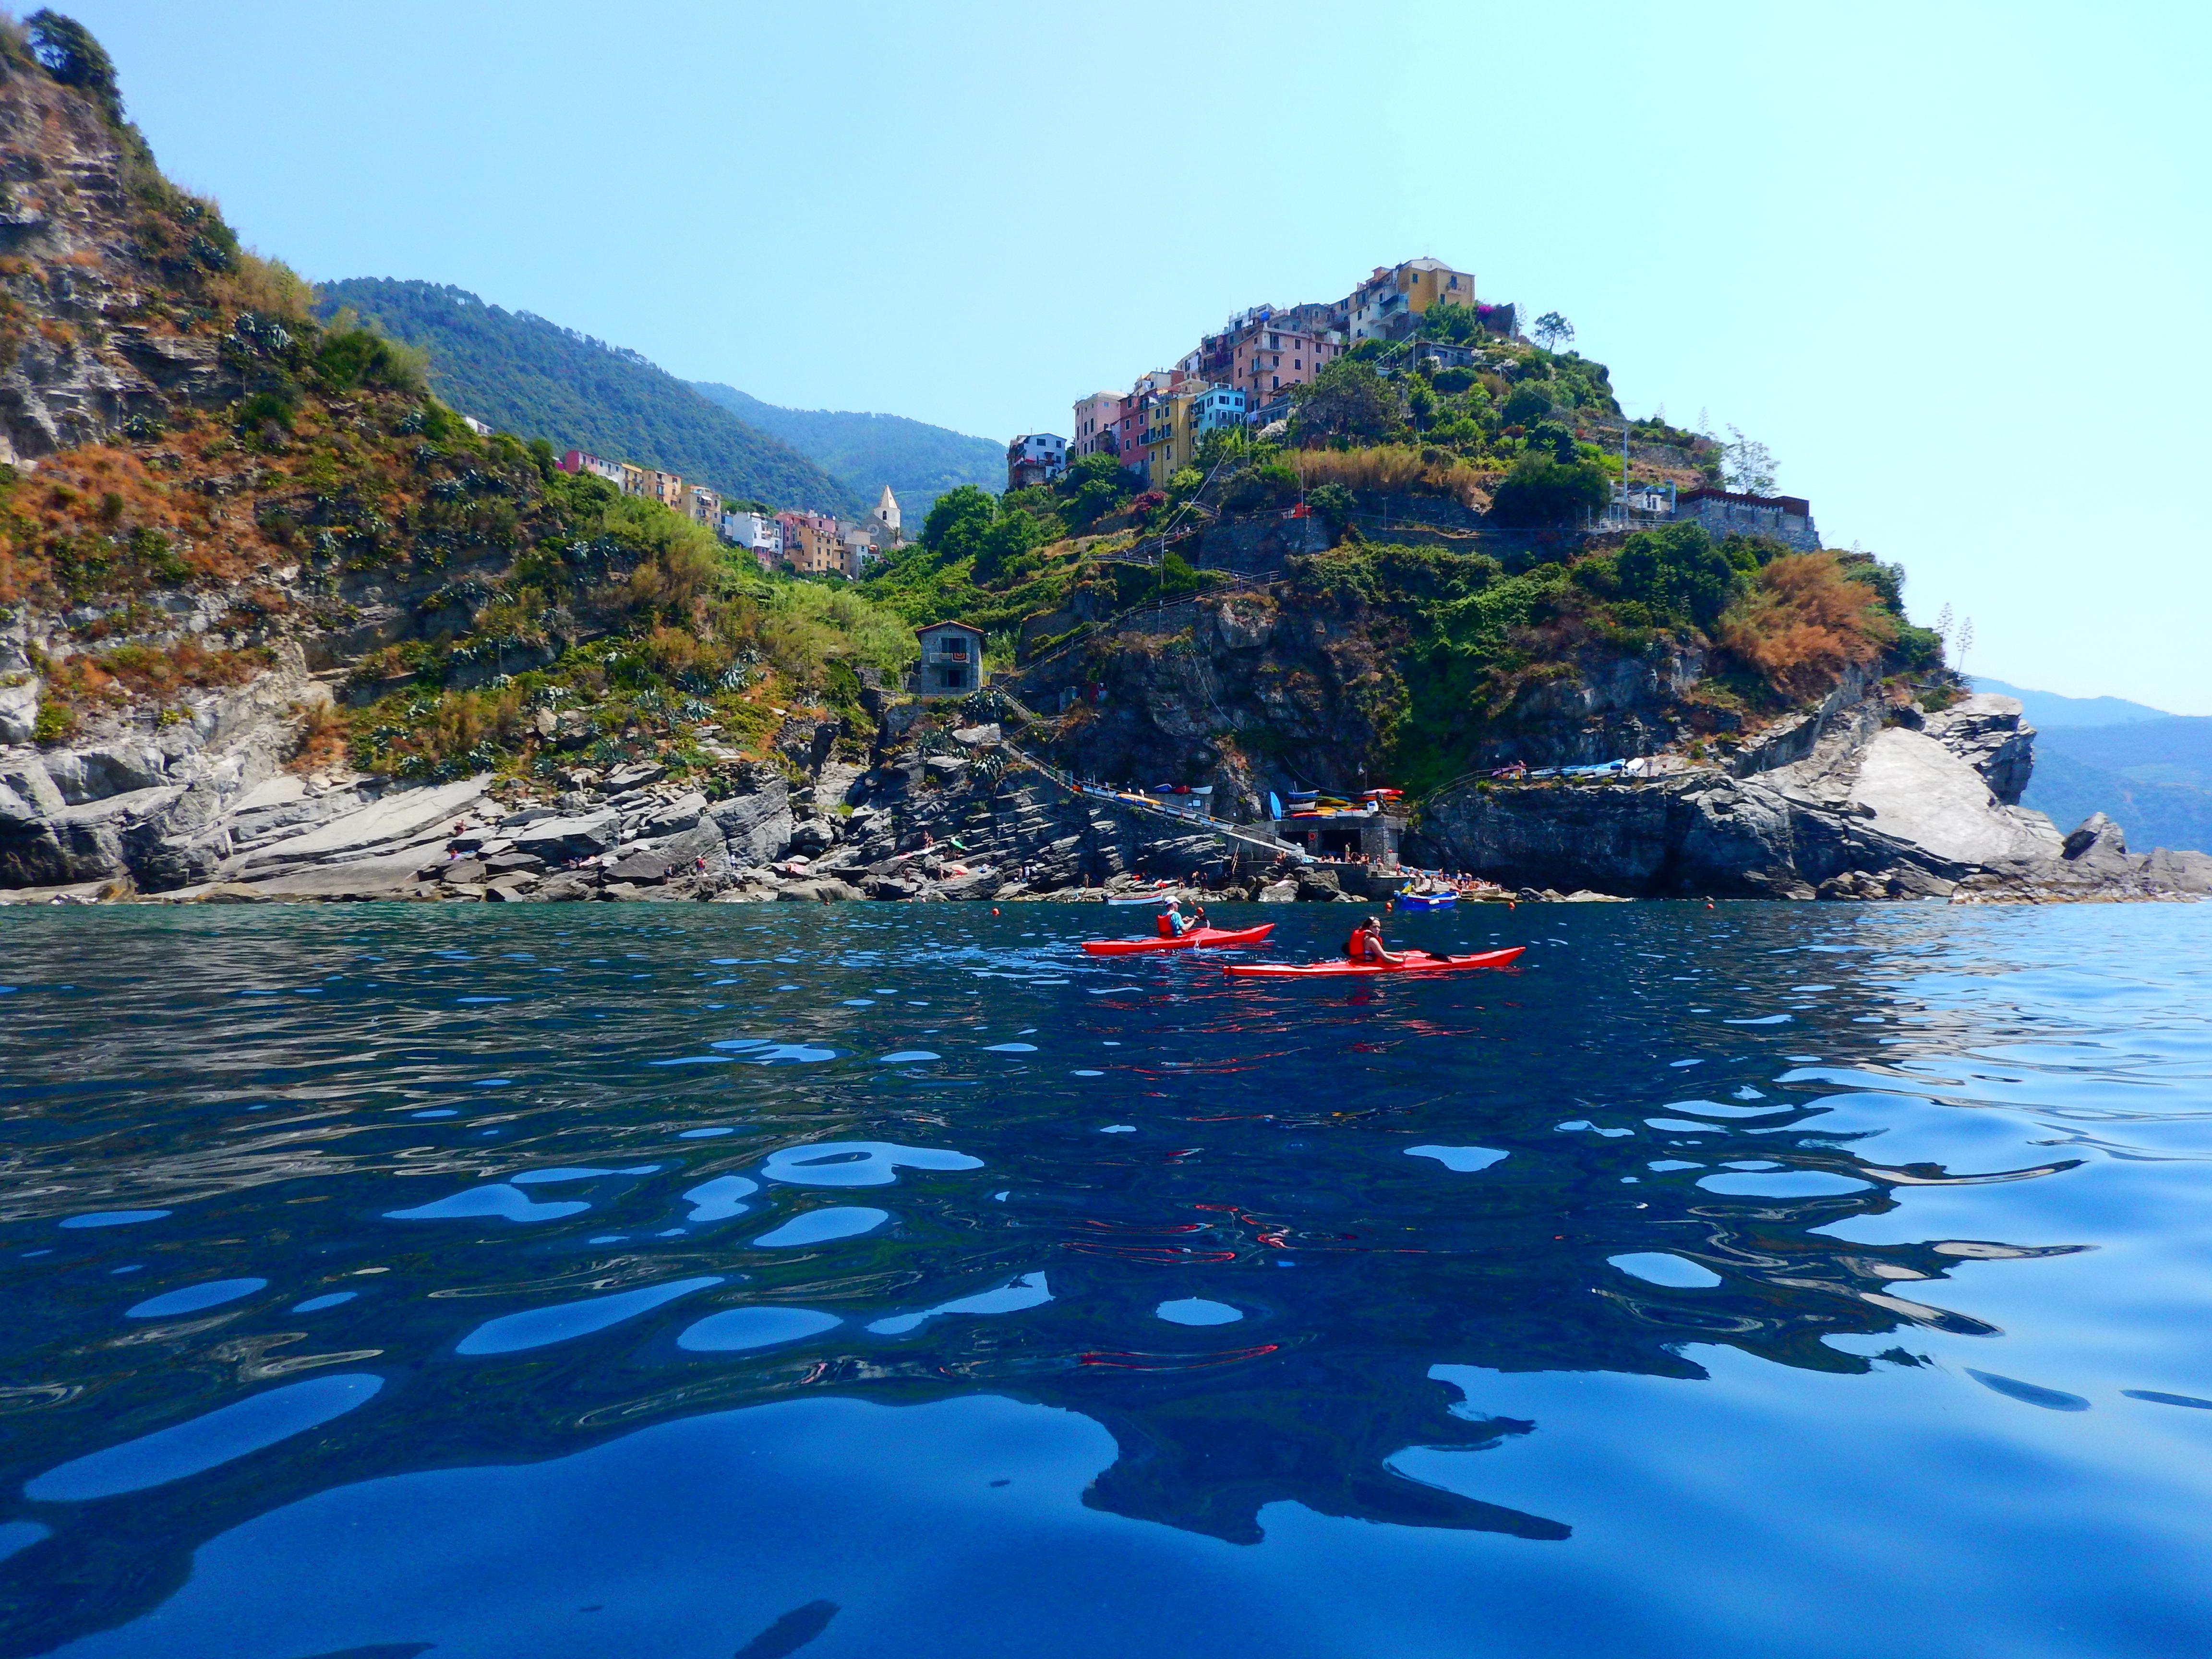 Cinque Terre Portovenere And Palmaria Island 2 Days By